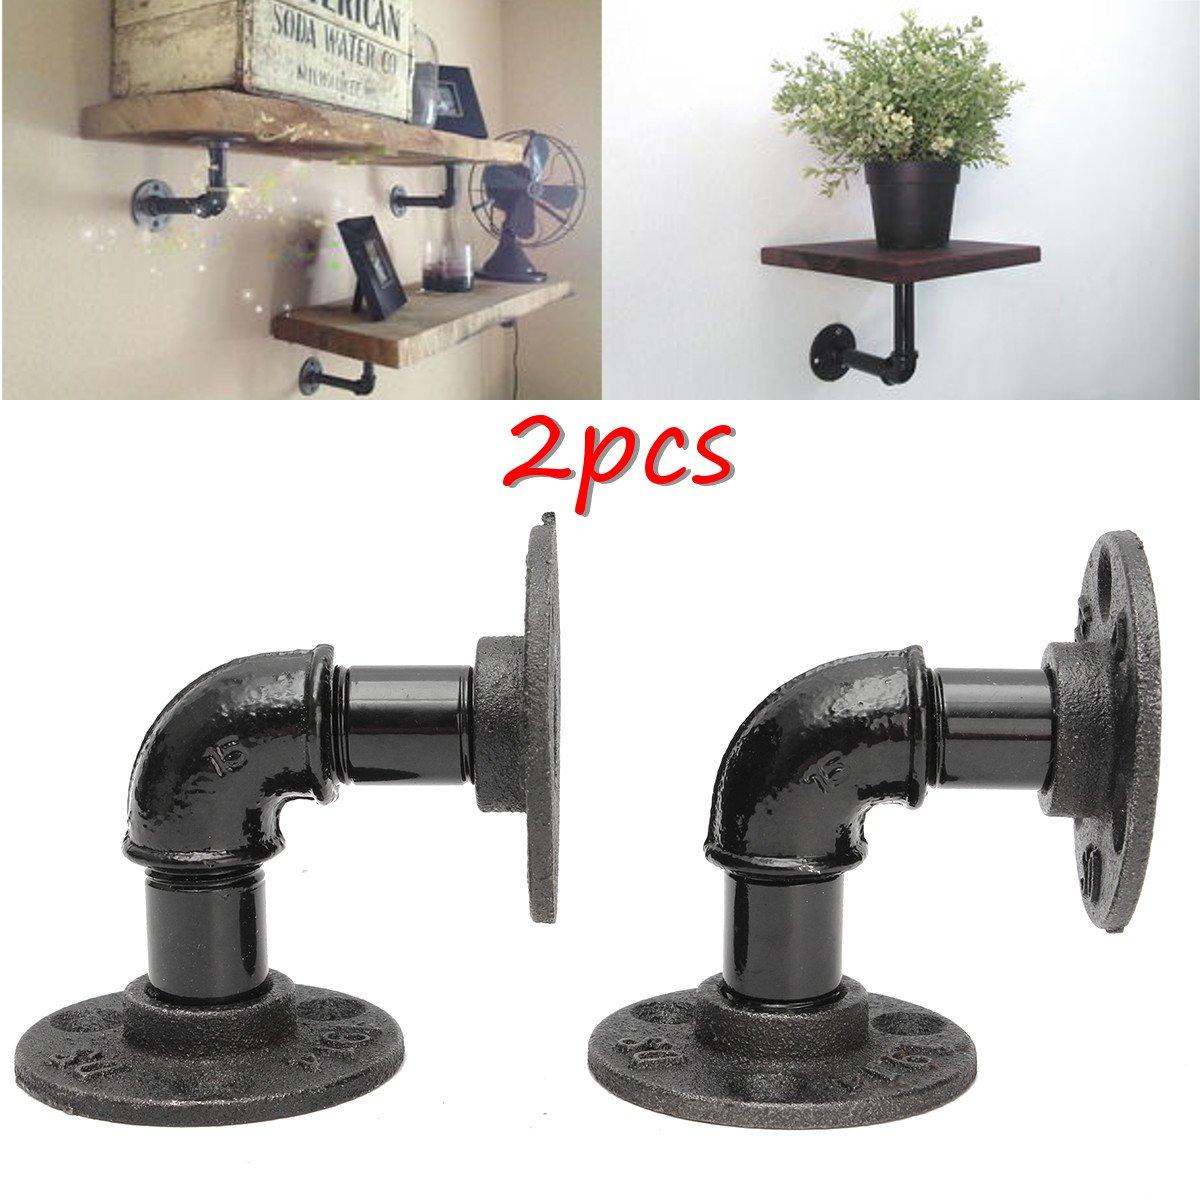 kingso 2pcs 8x8cm industrial black iron pipe shelf bracket wall mounted floating ebay. Black Bedroom Furniture Sets. Home Design Ideas